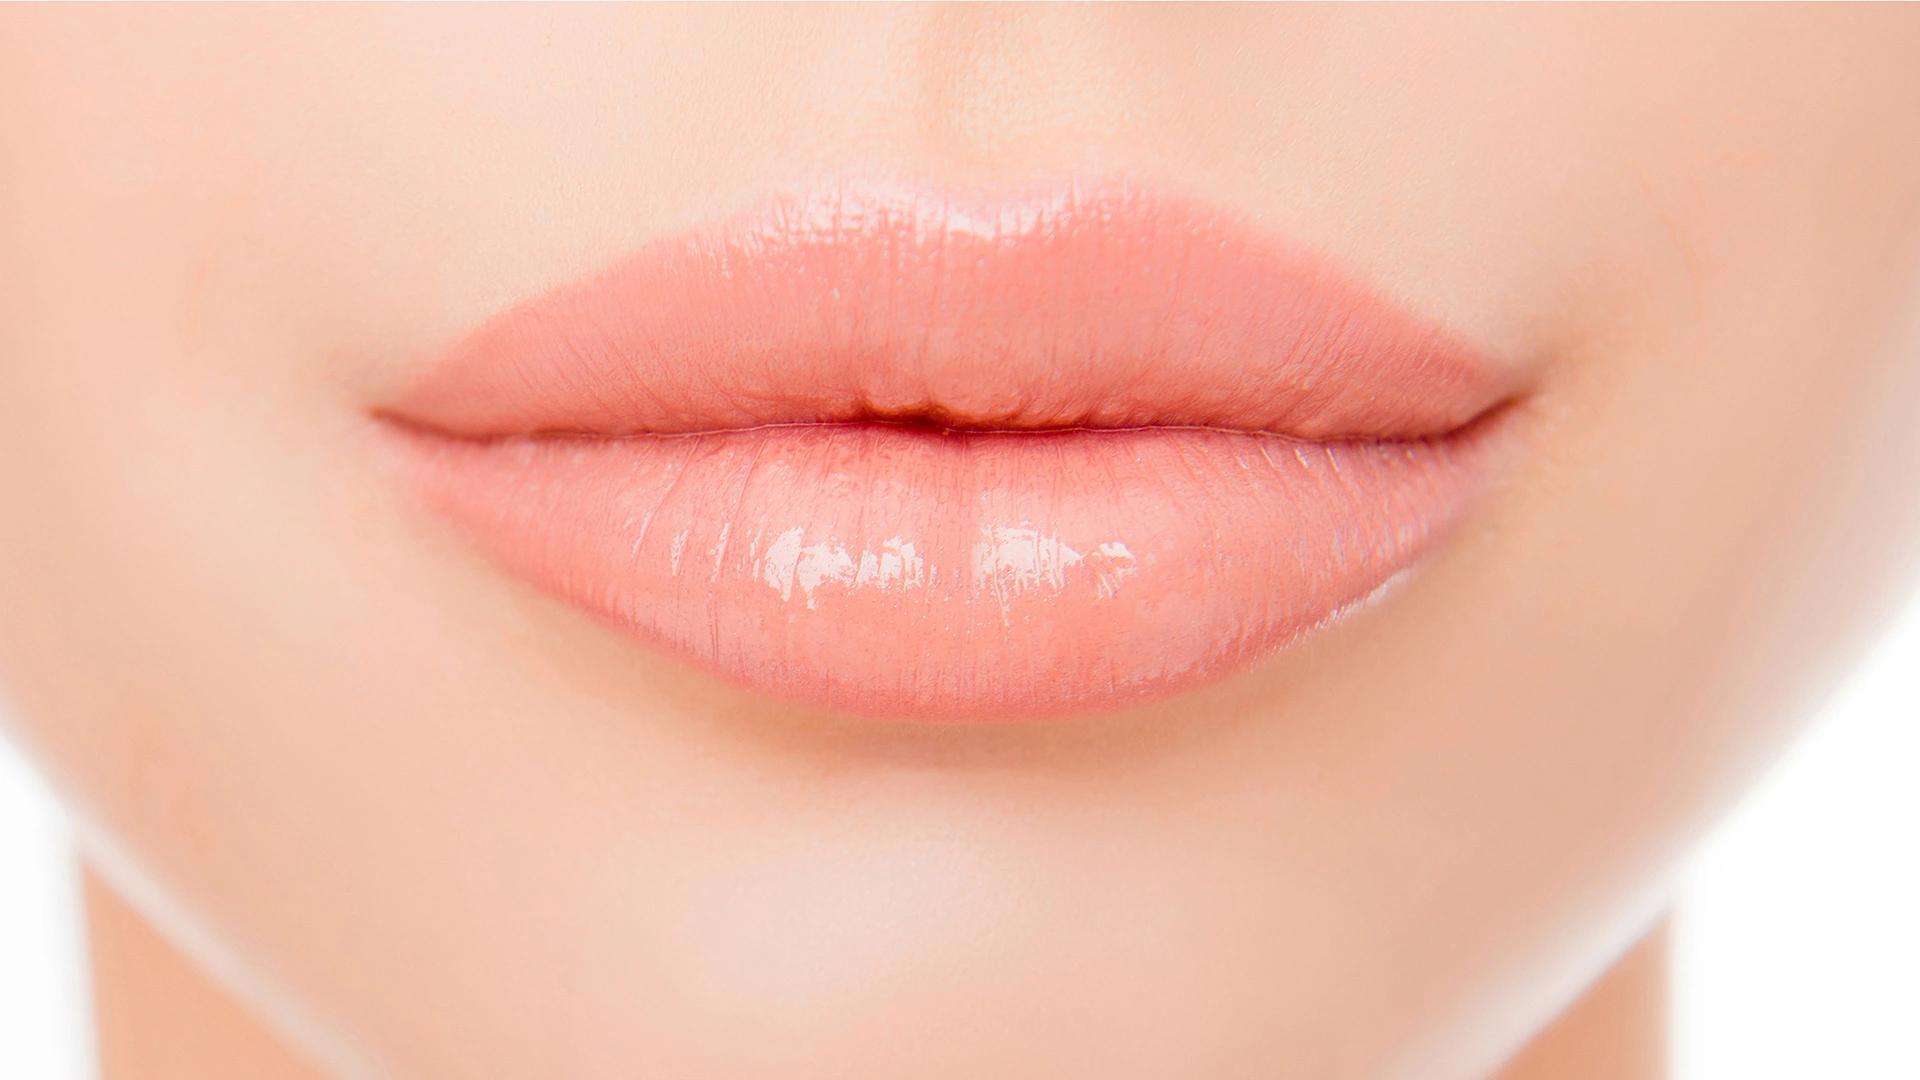 Peachy permanent lips